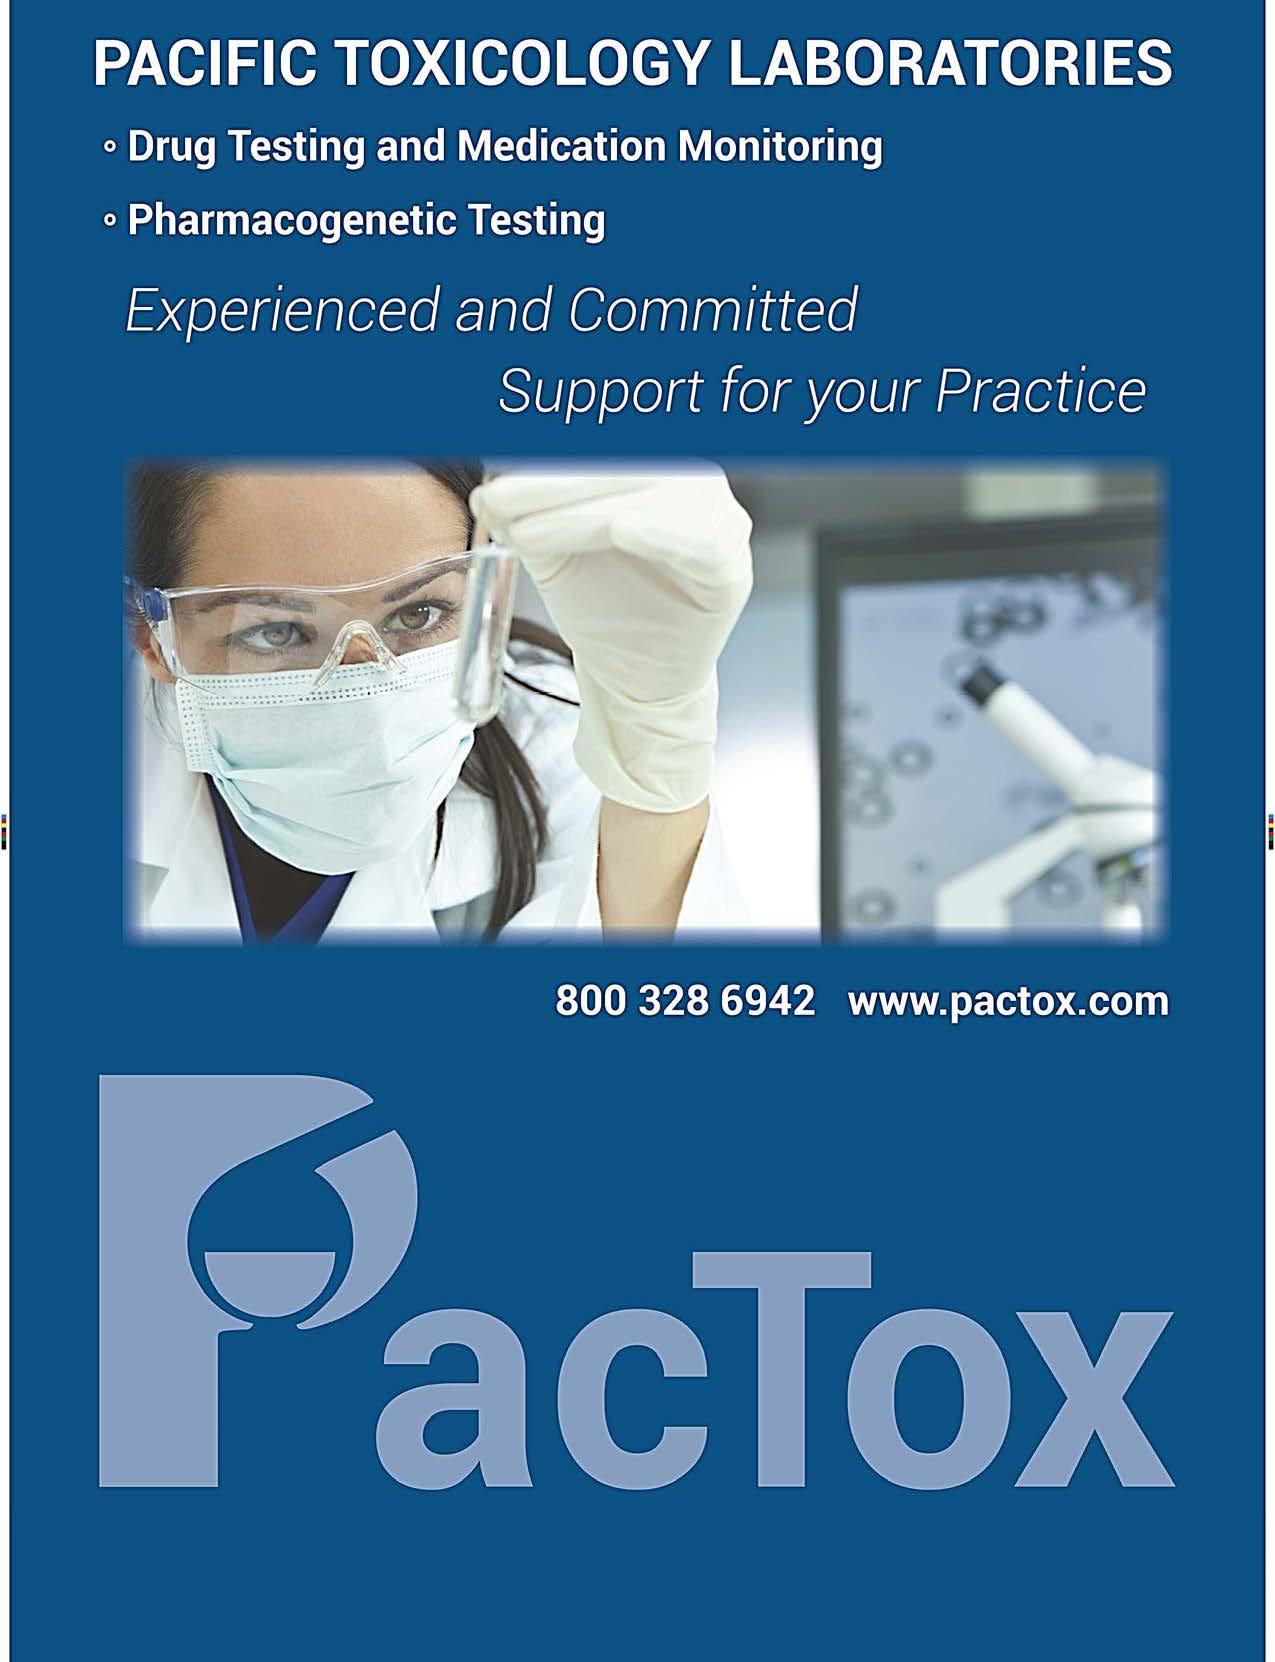 pacrox logo